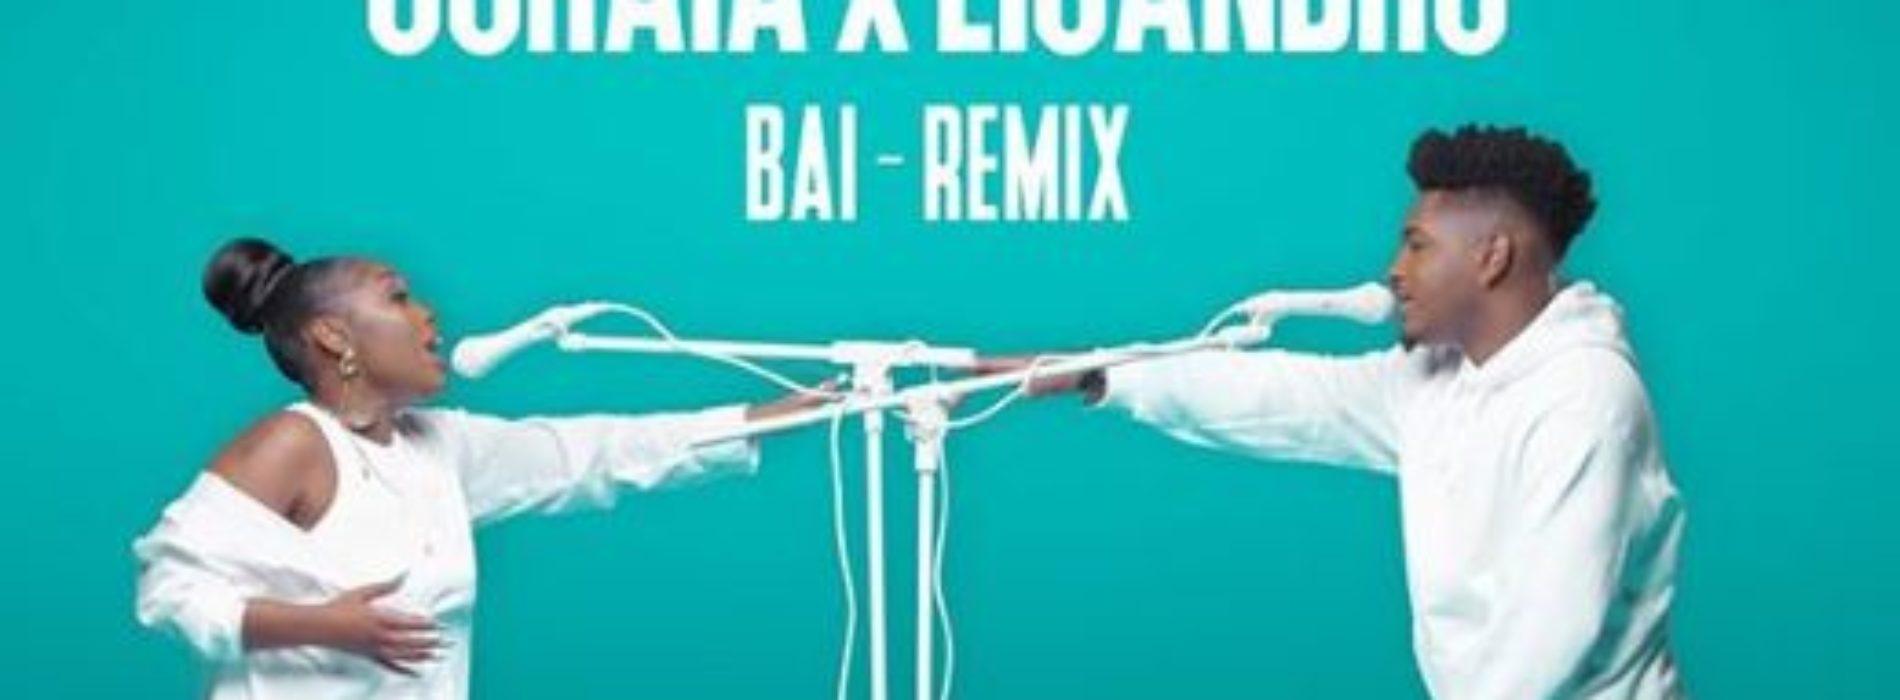 Soraia x Lisandro – Bai (Remix) – Février 2020